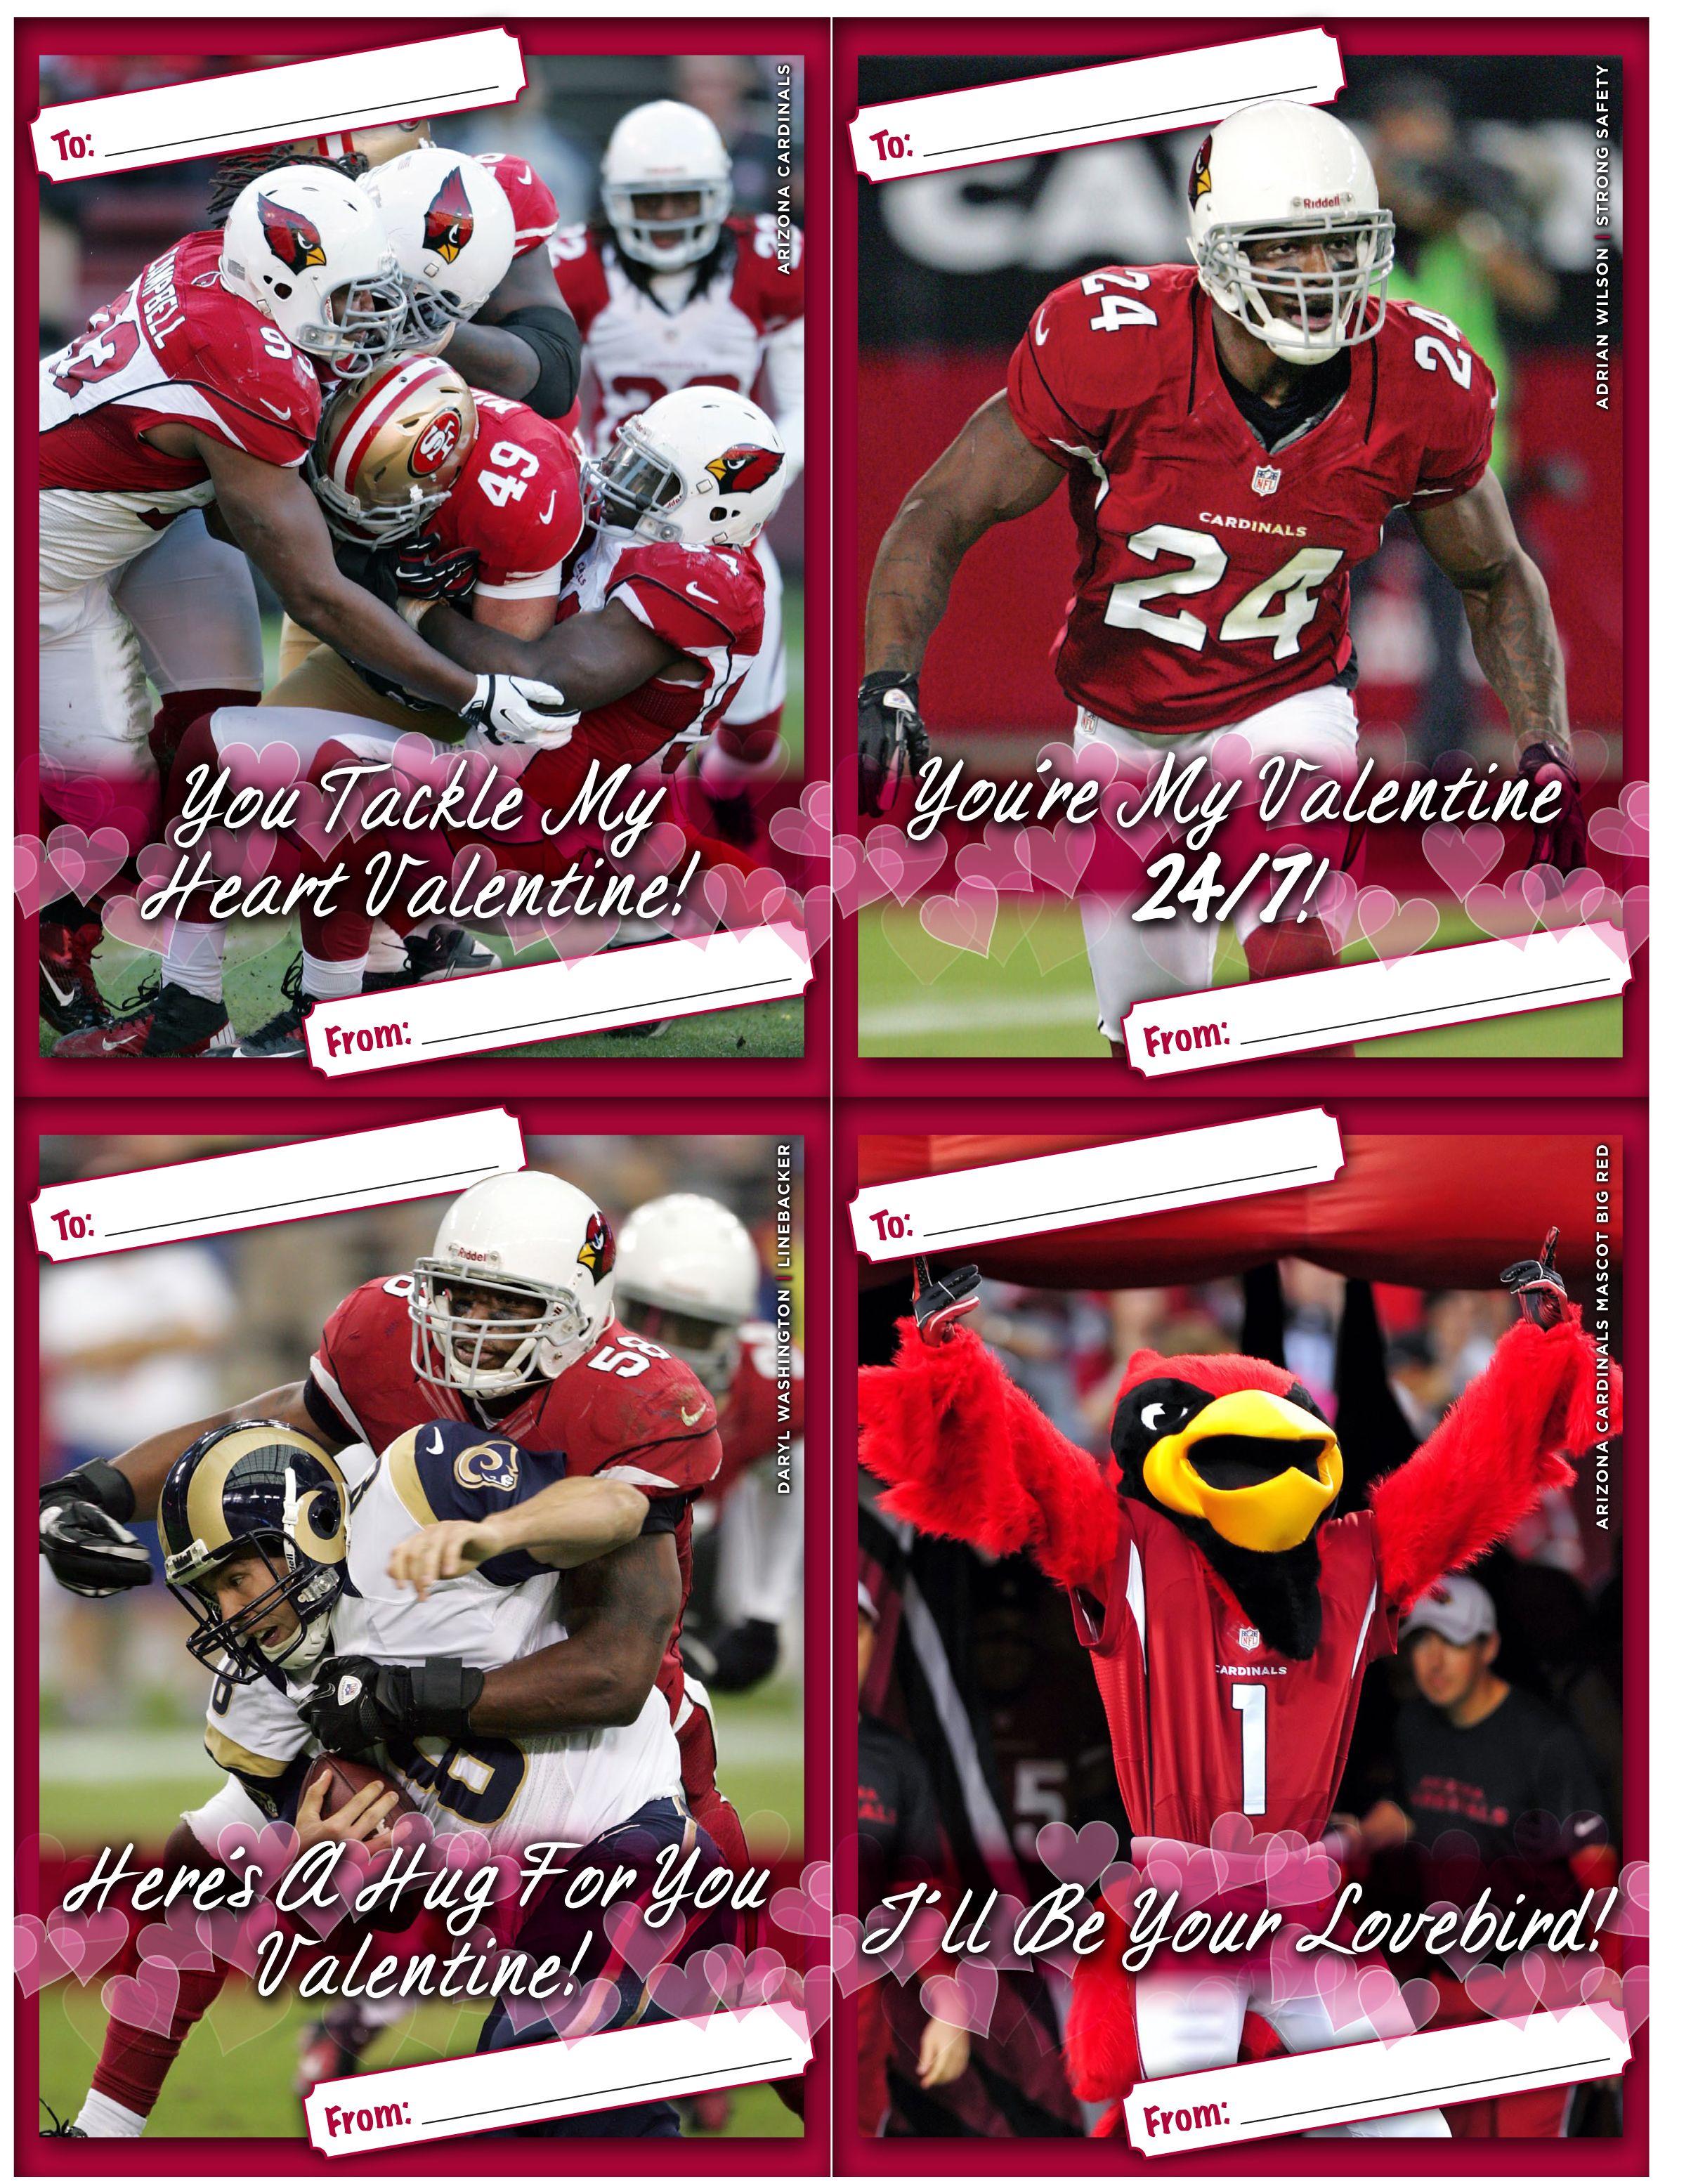 Valentines Day Cards I Arizona Cardinals 2013 Valentines Day Cards – Football Valentines Day Cards